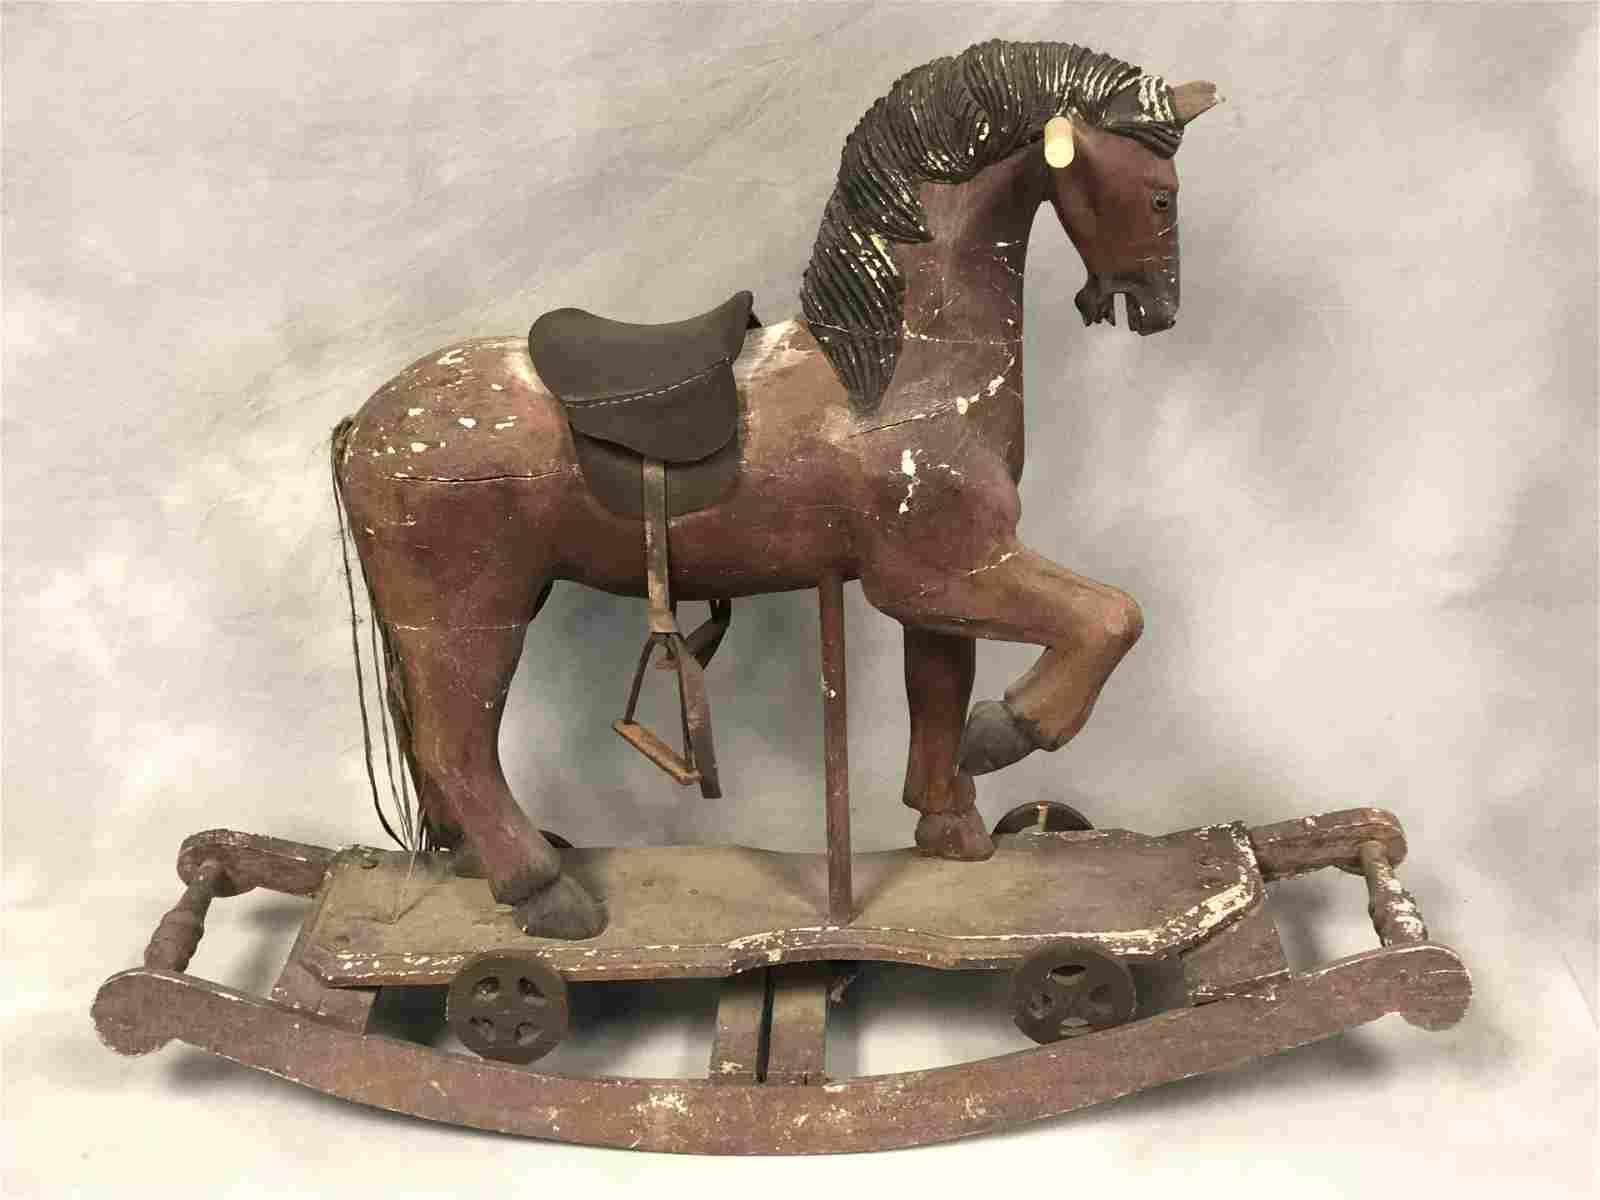 Vtg Wooden Childs/ Doll Rocking Horse - Leather Saddle,